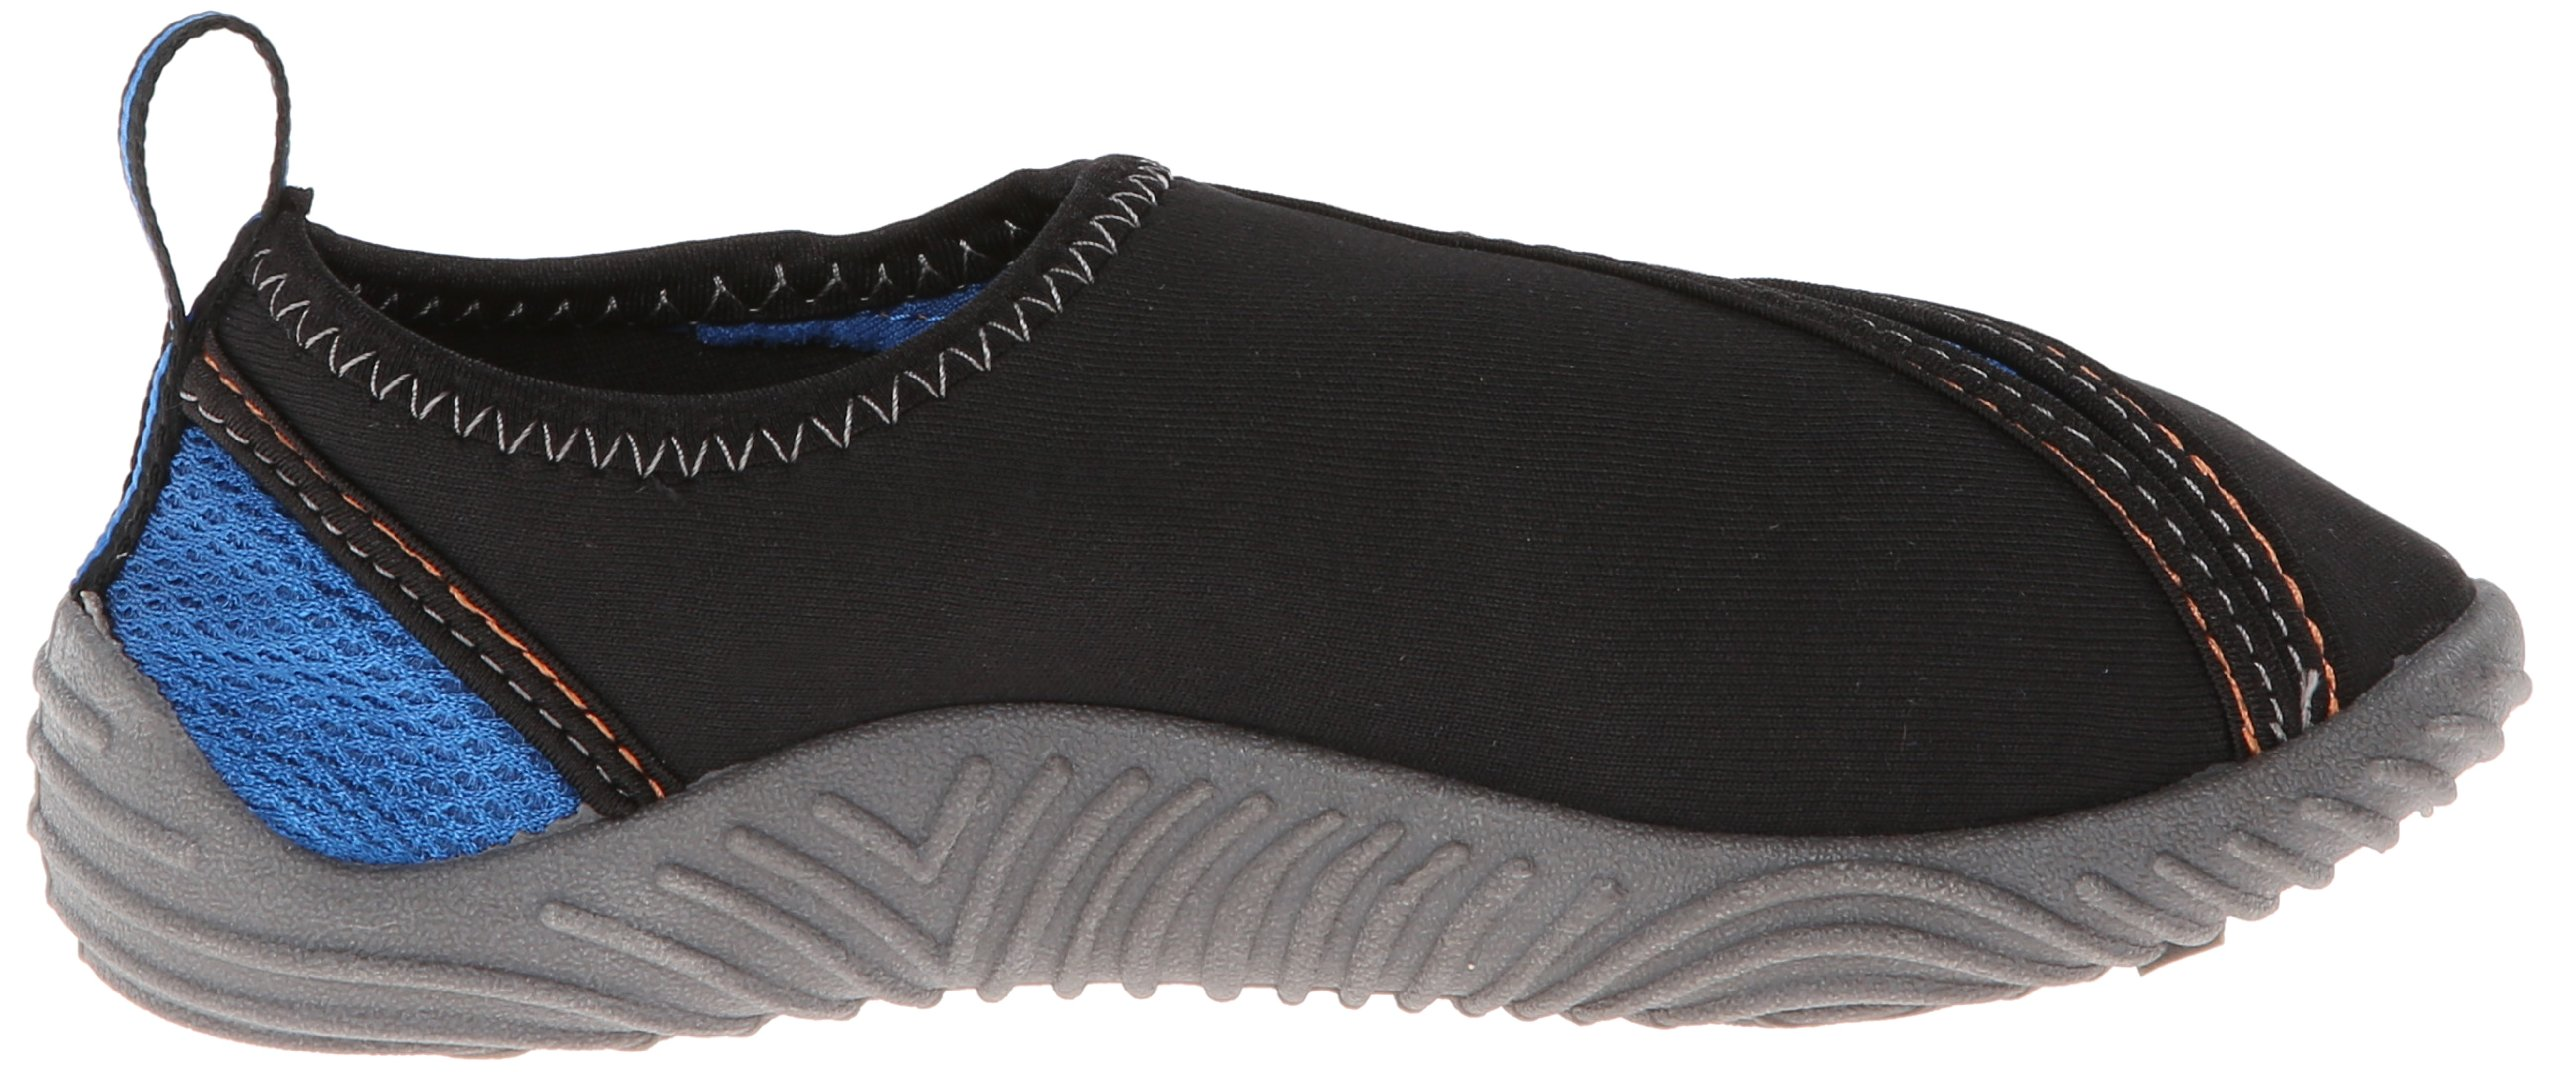 Speedo Kids Surfwalker Pro Mesh Water Shoe 7749173